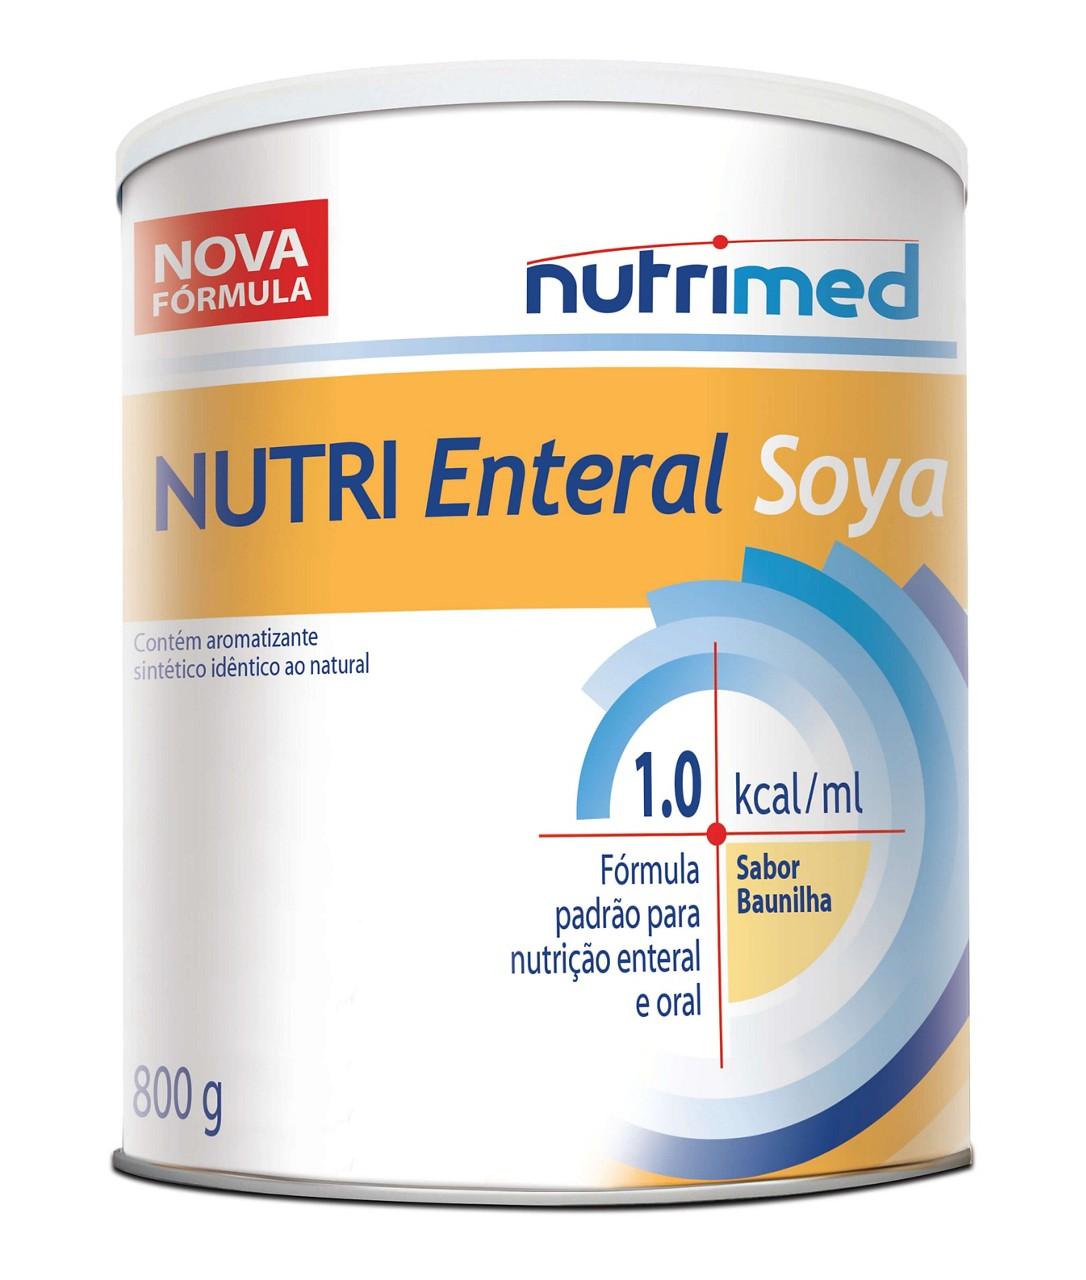 11--NUTRI ENTERAL SOYA Po.jpg